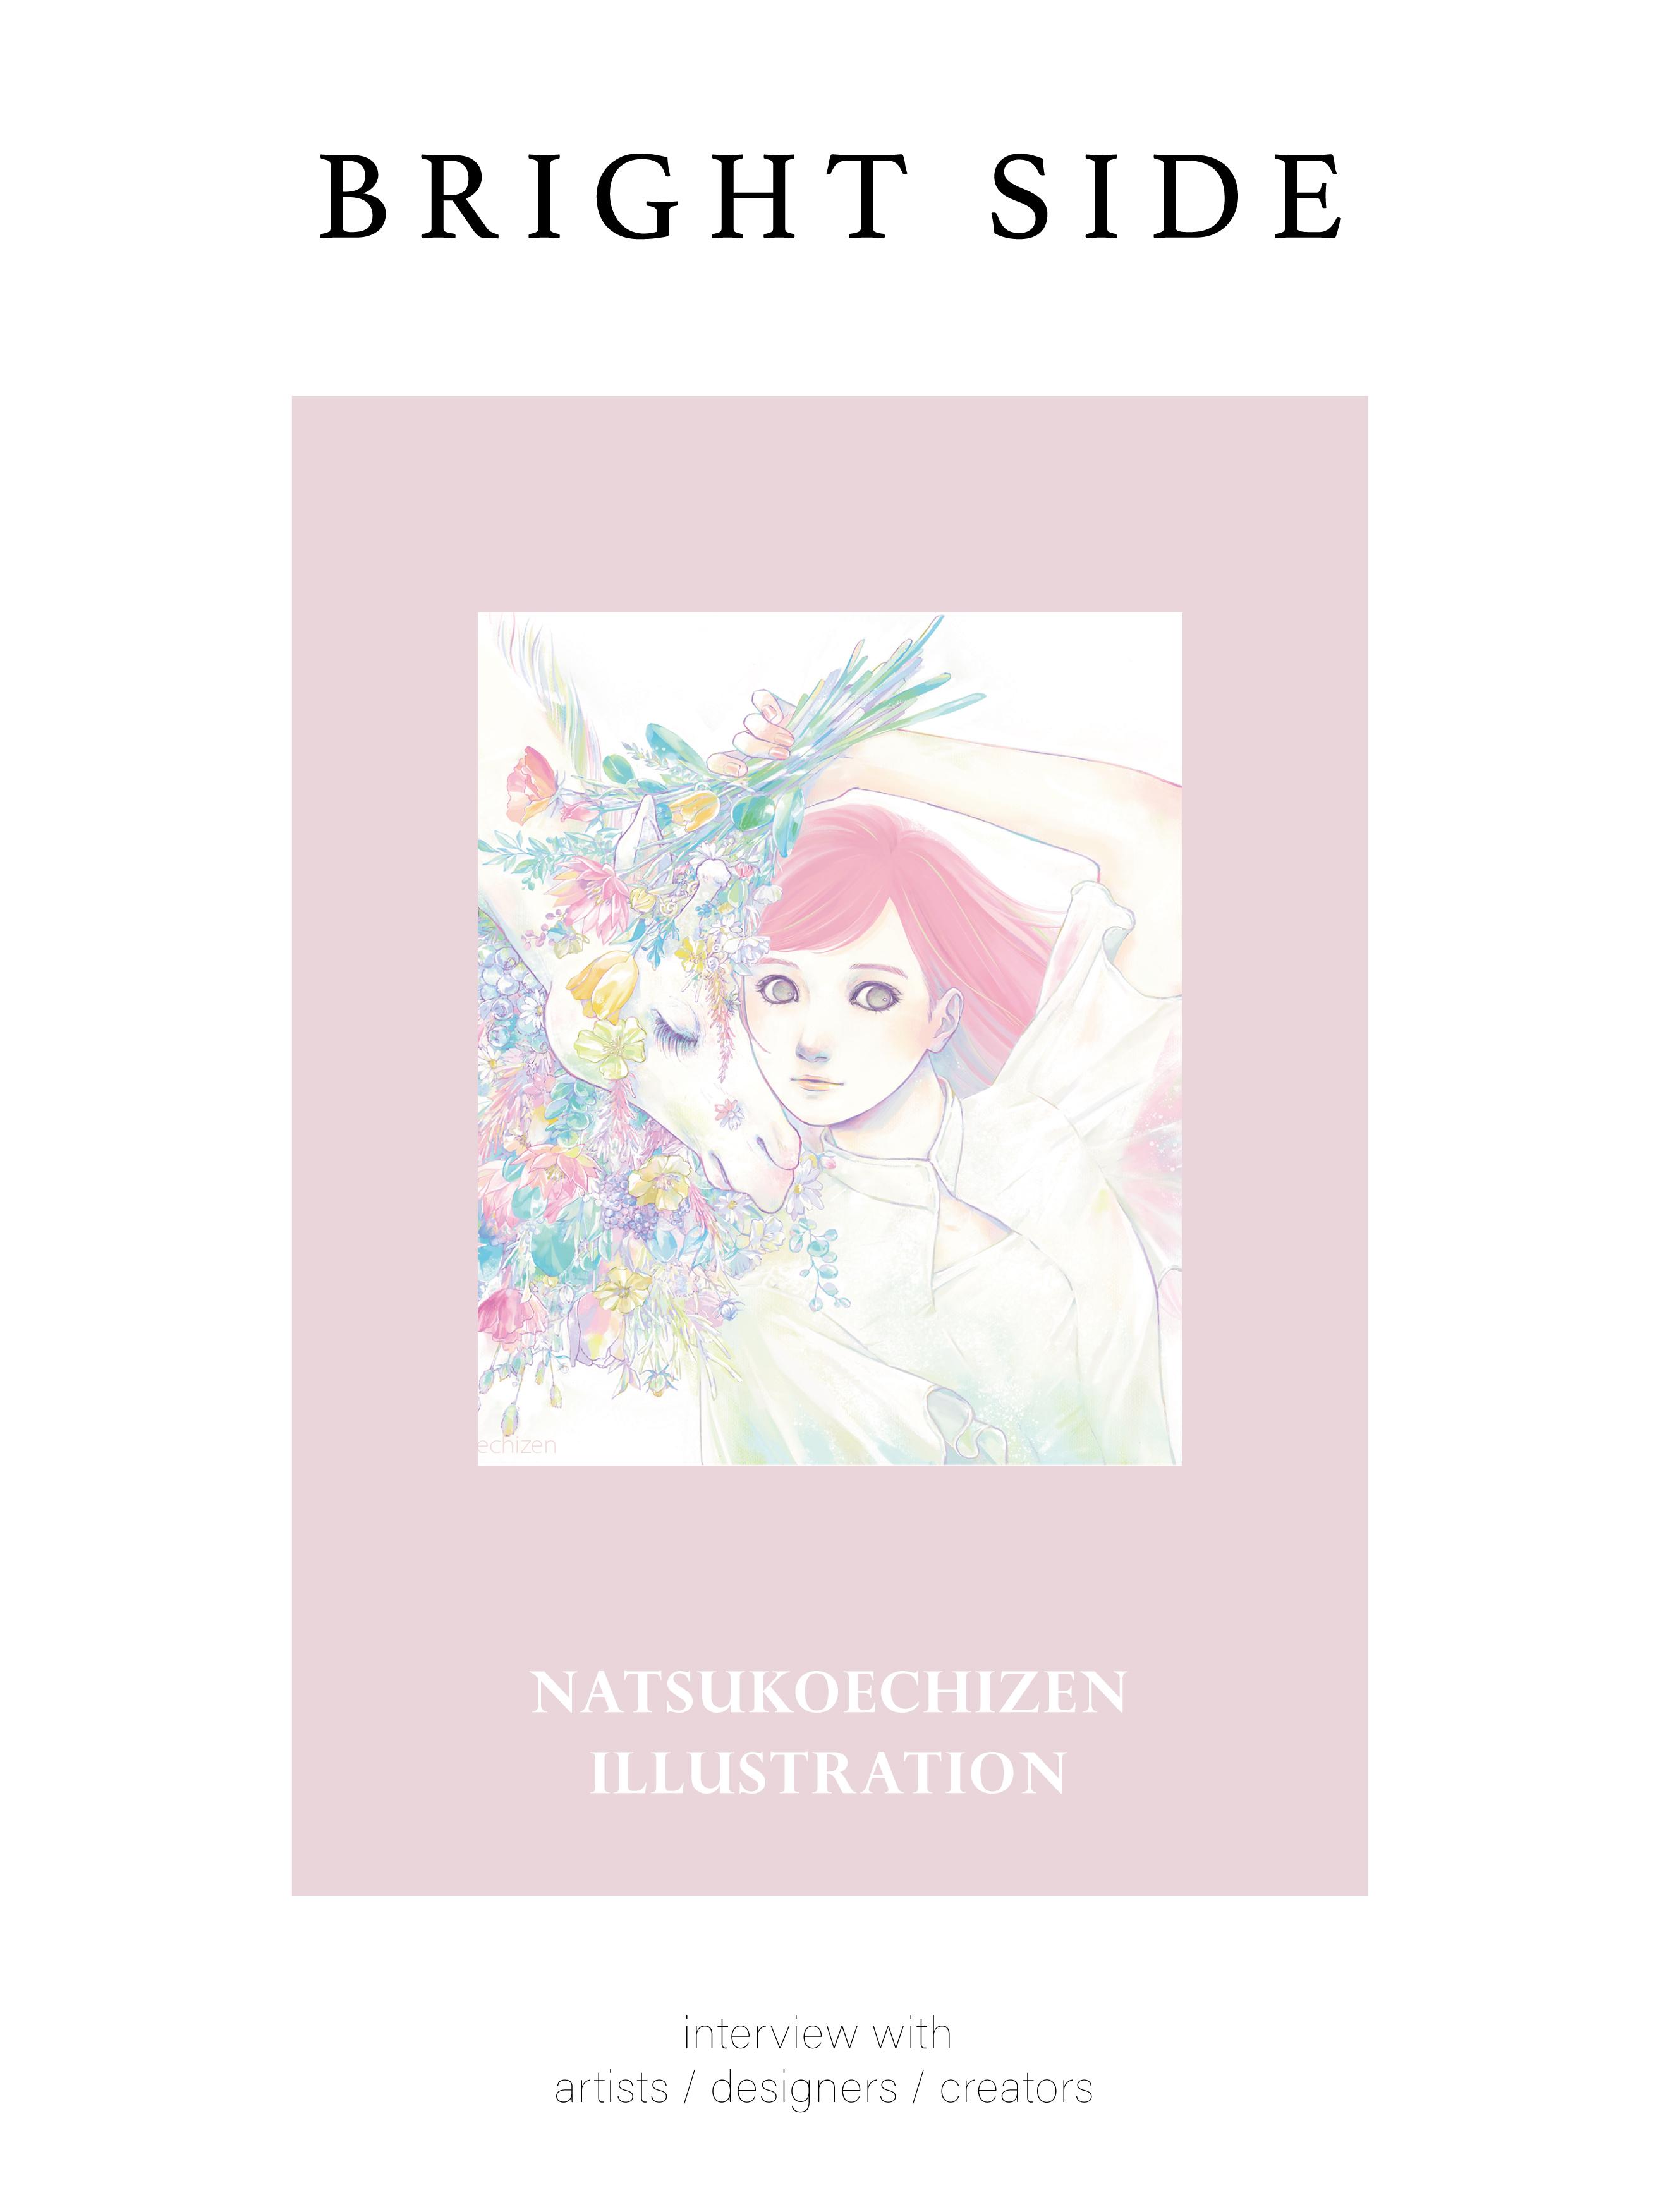 B: master _ Natsuko Echizen